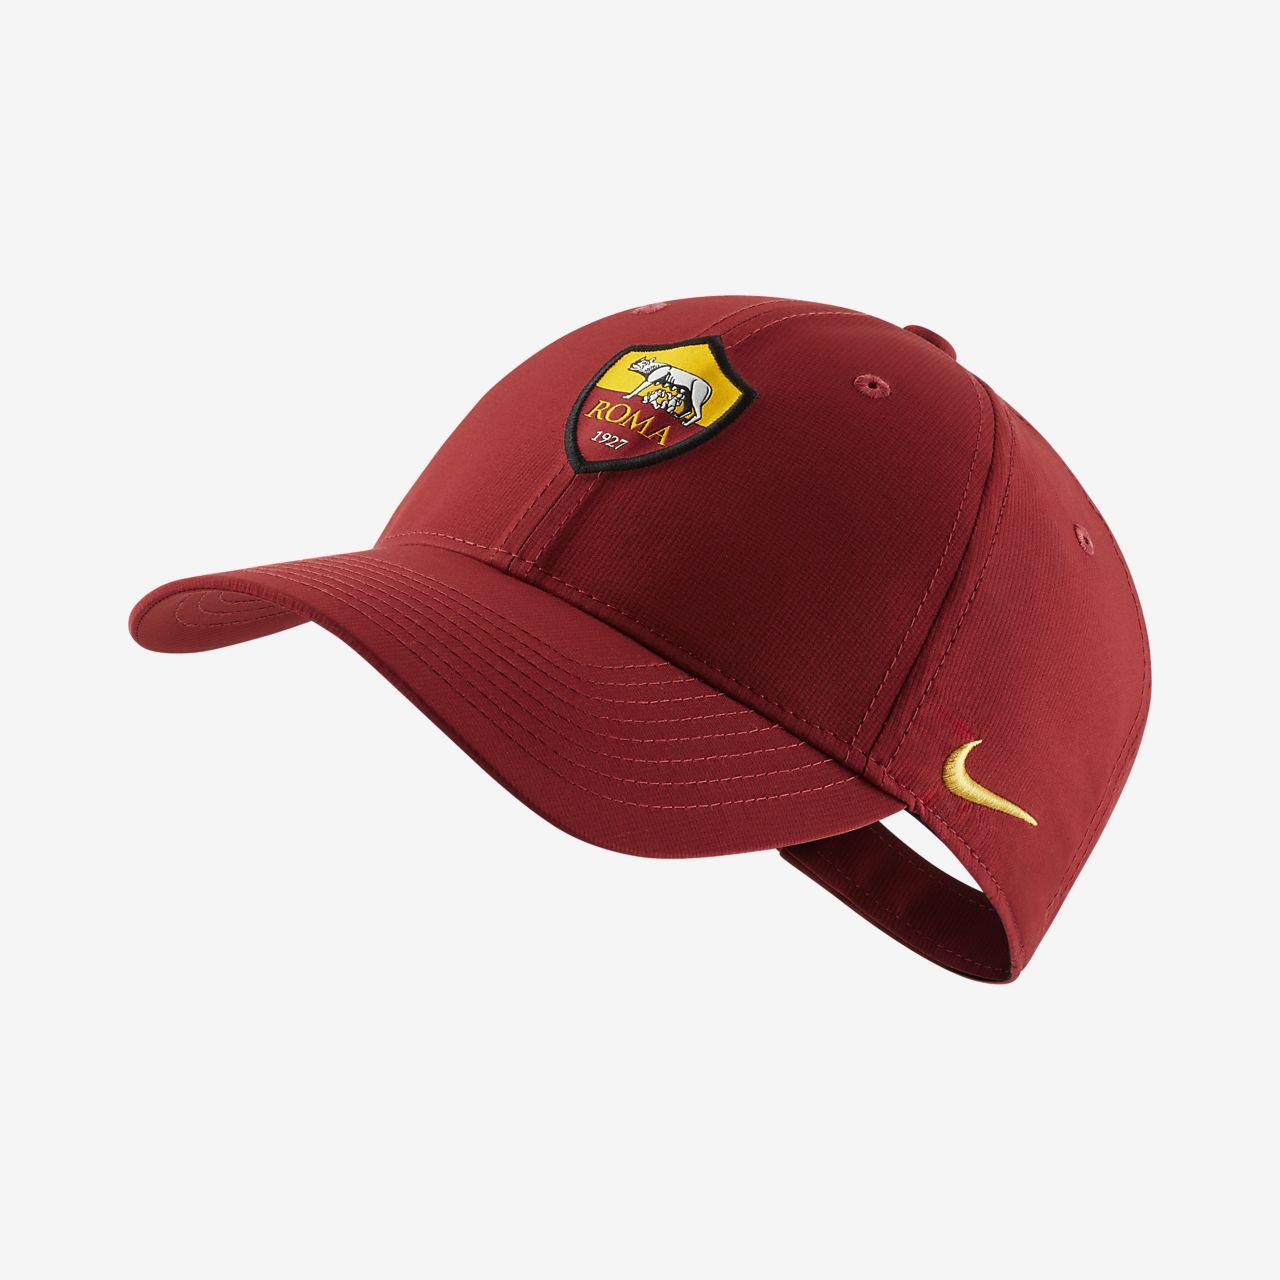 Justerbar keps Nike Dri-FIT A.S. Roma Legacy91